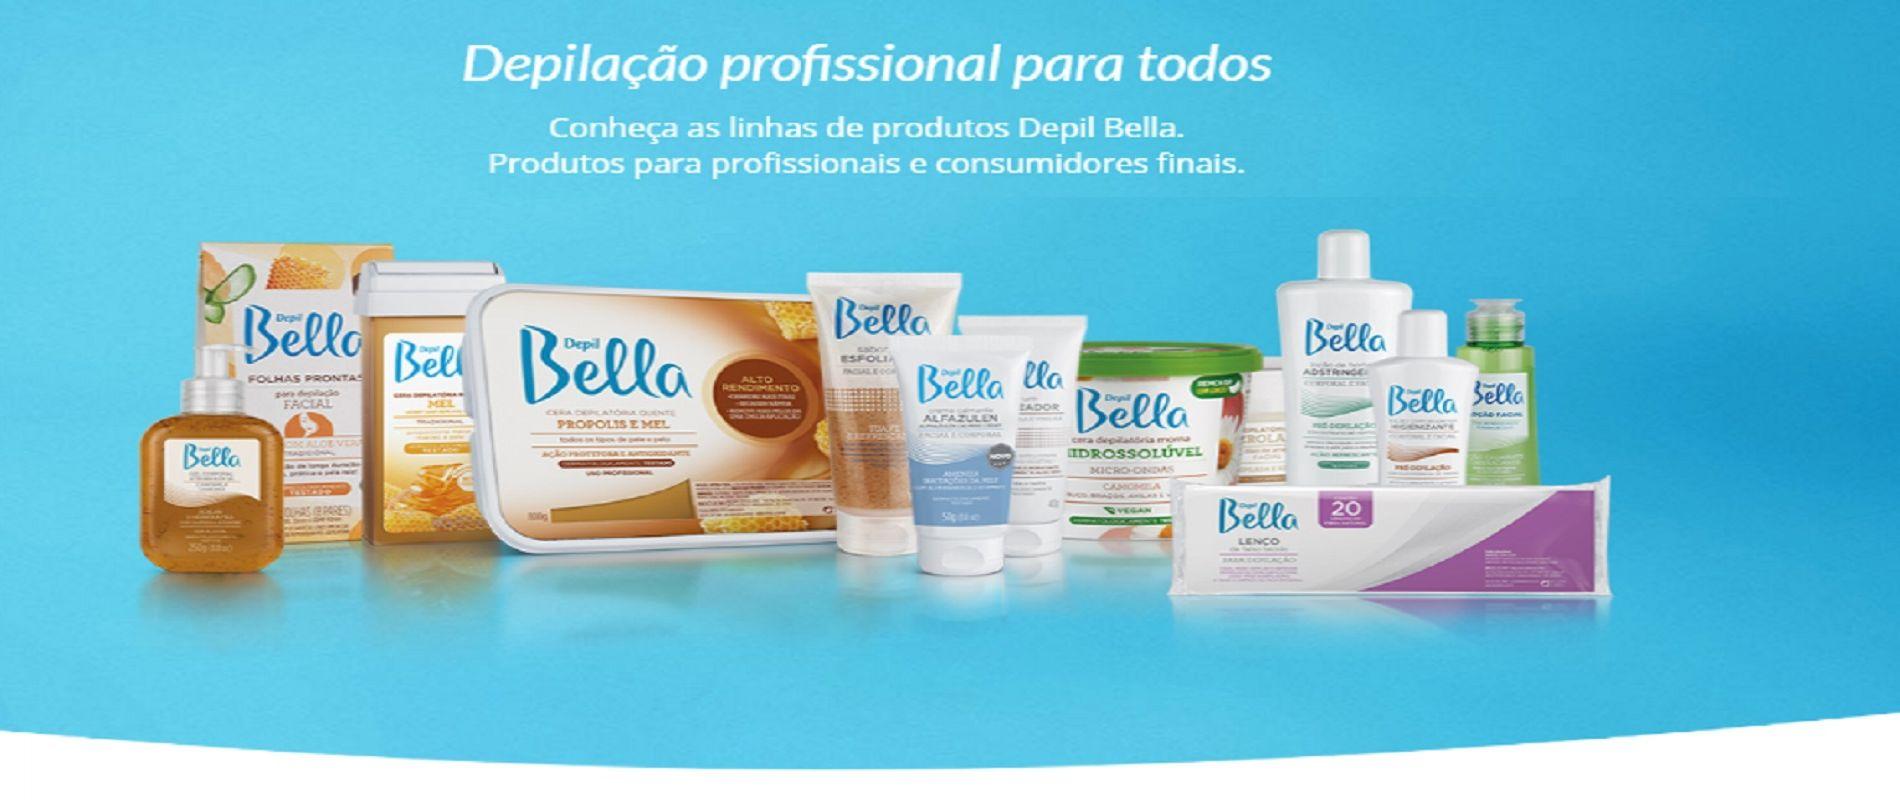 https://goyaperfumaria.com.br/brand/depil-bella